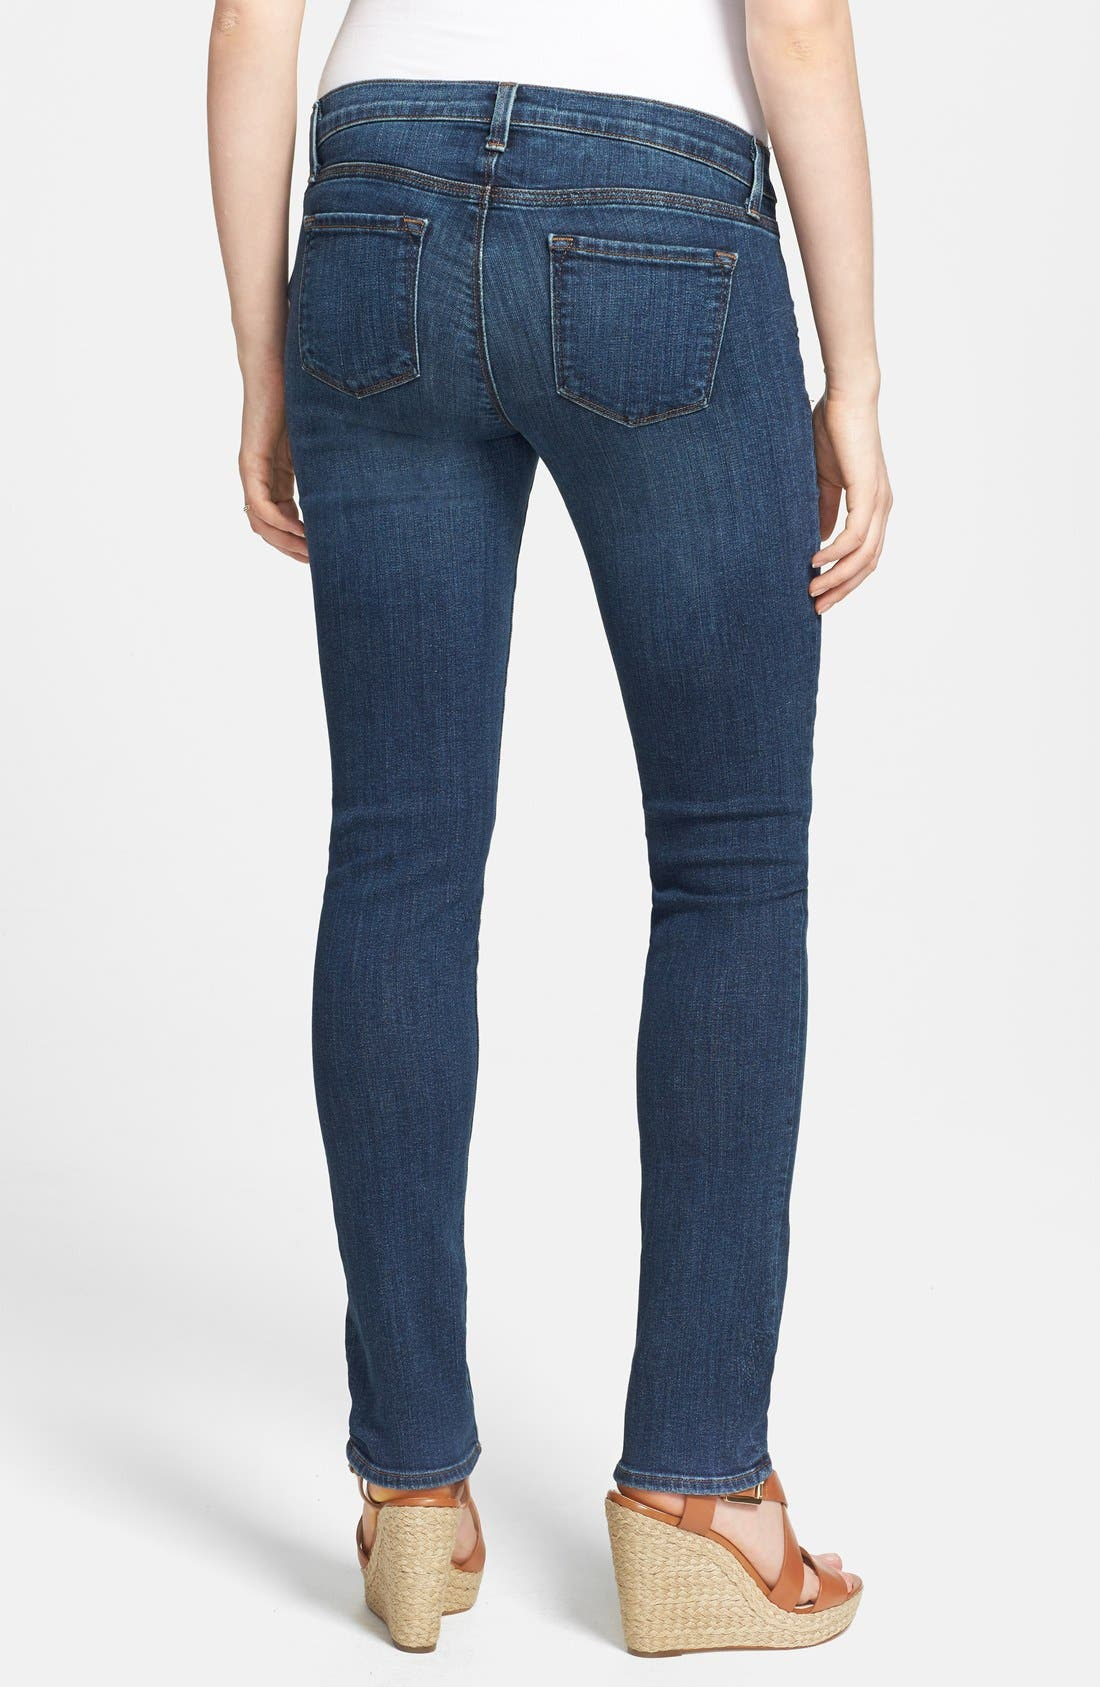 Alternate Image 2  - J Brand 'Rail' Skinny Maternity Jeans (Eminence)